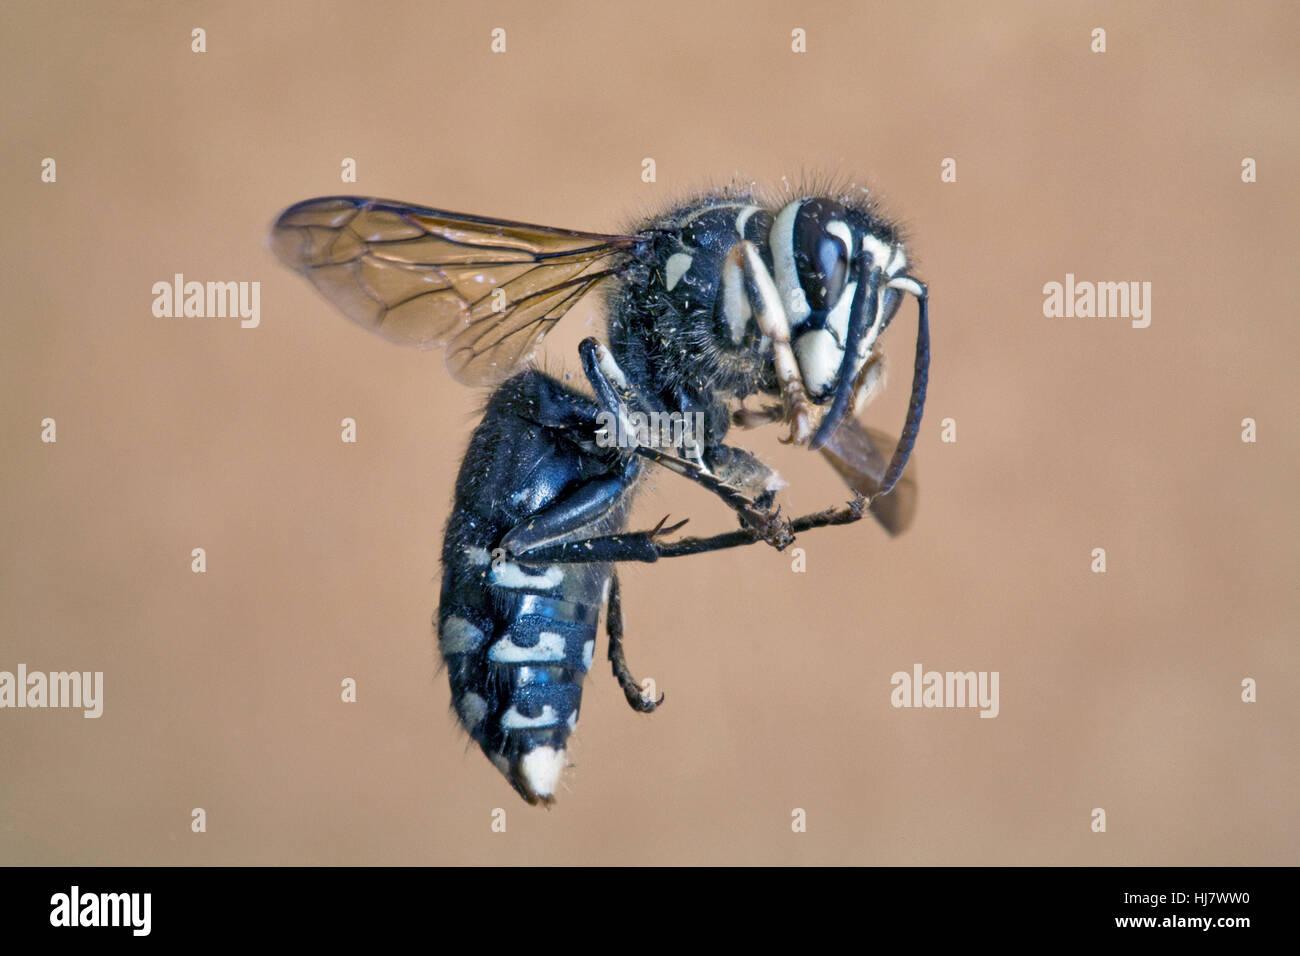 A bald-faced hornet, Vespula maculata, in flight - Stock Image